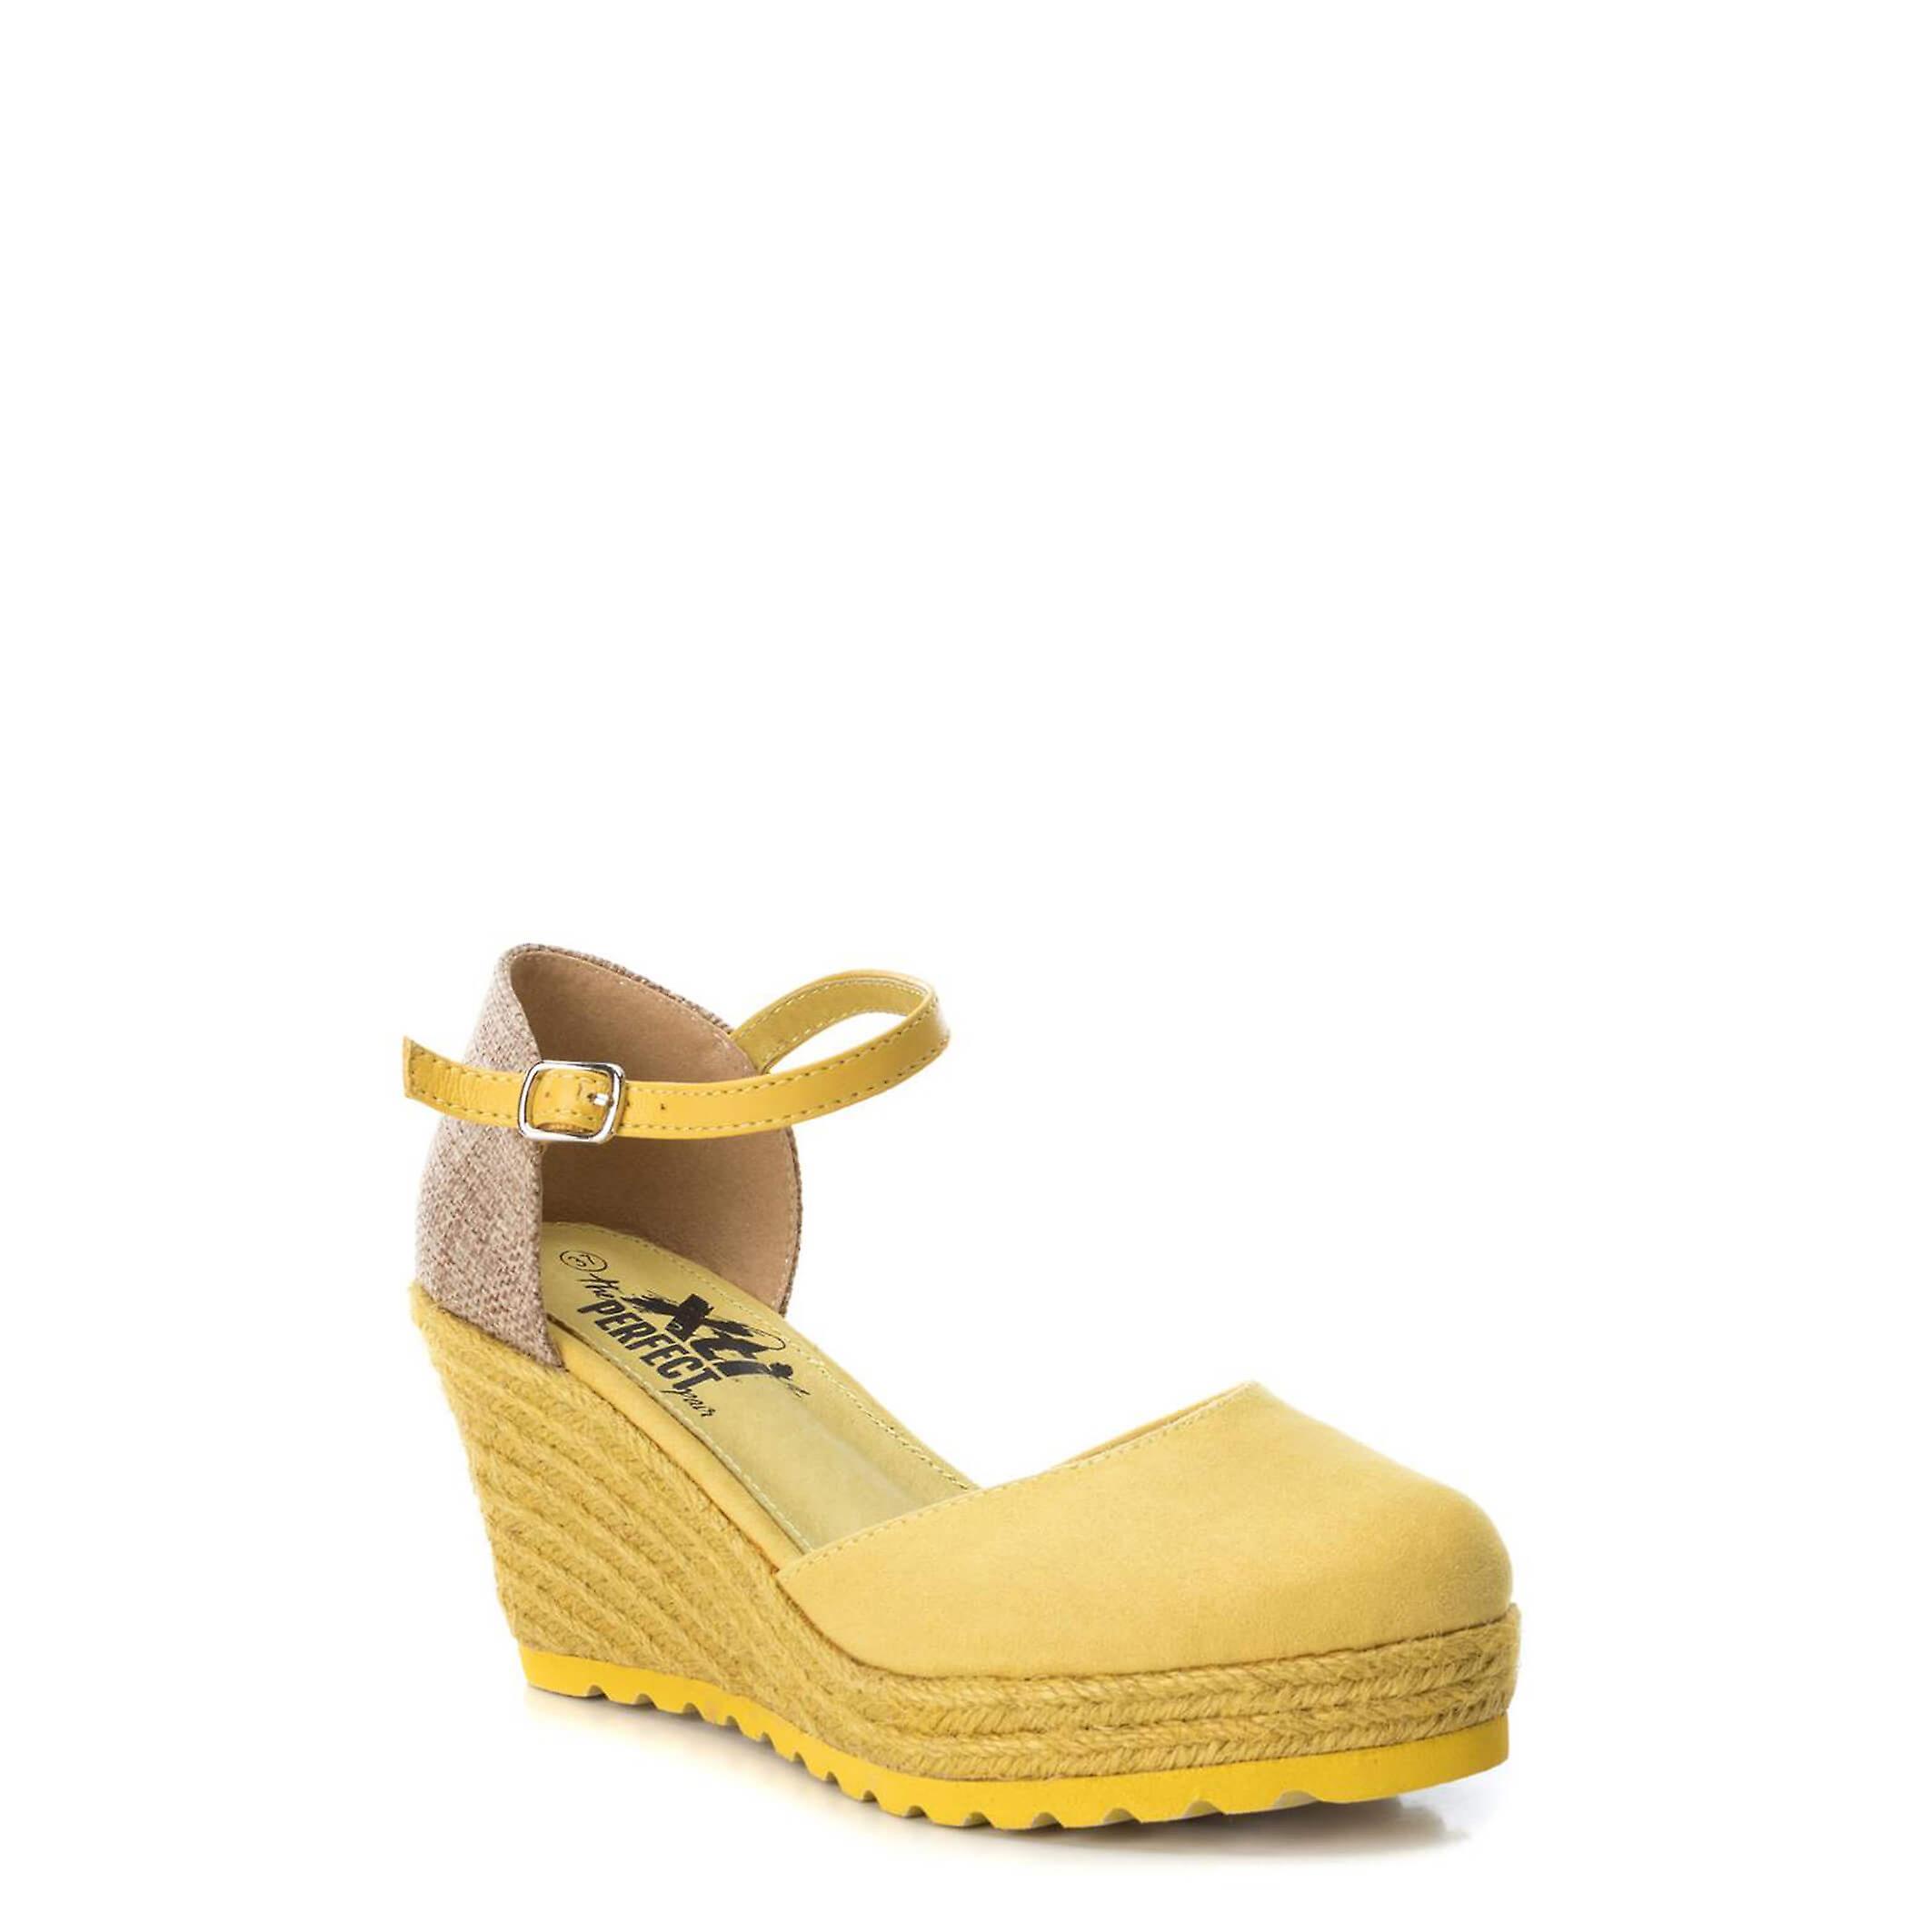 Xti Original Women Spring/summer Wedge - Yellow Color 40200